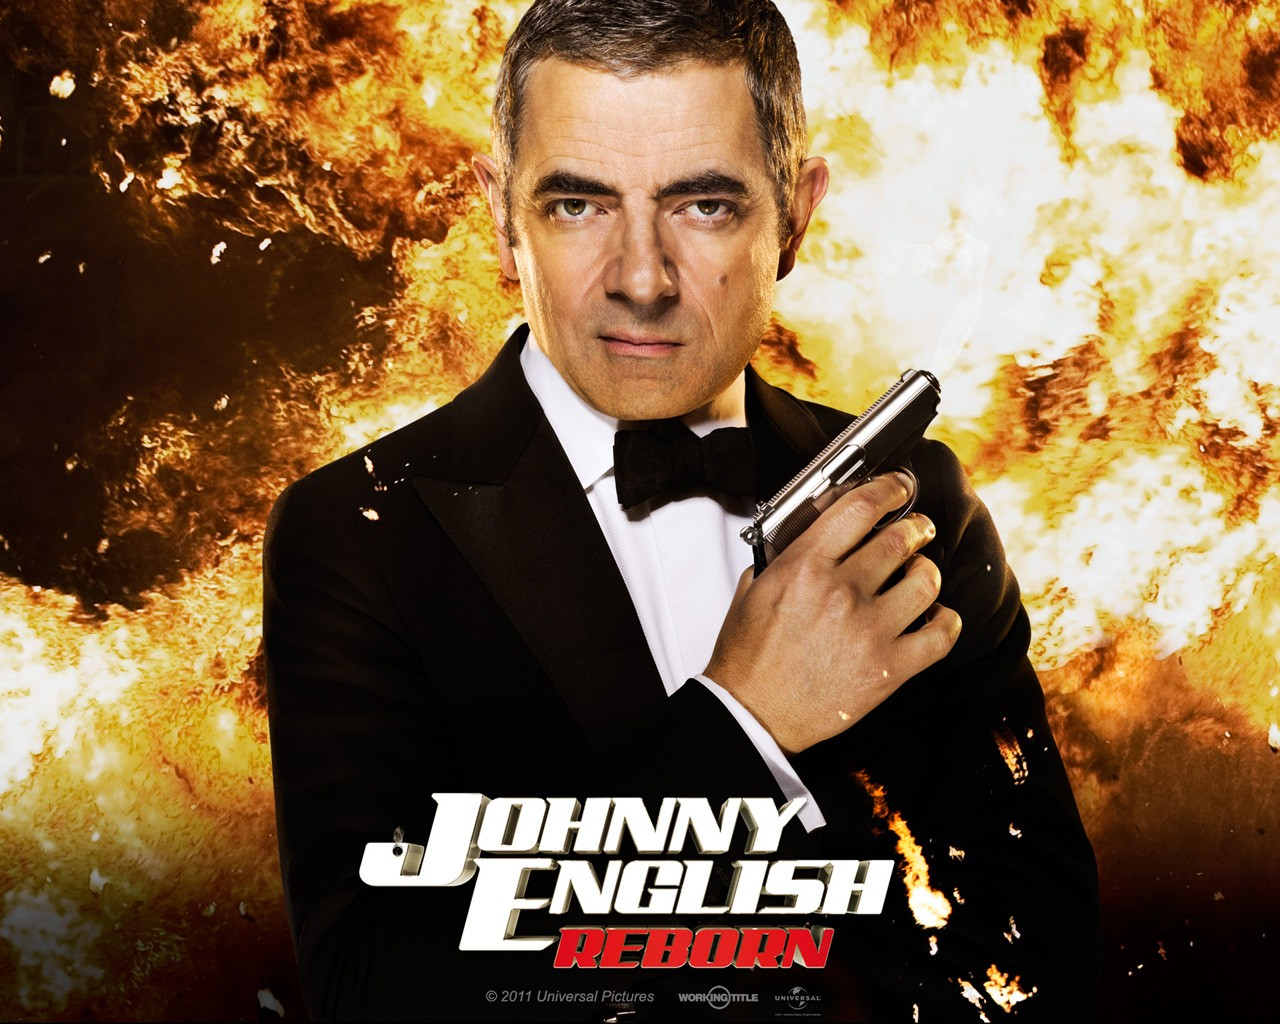 johnny english reborn ndash - photo #7